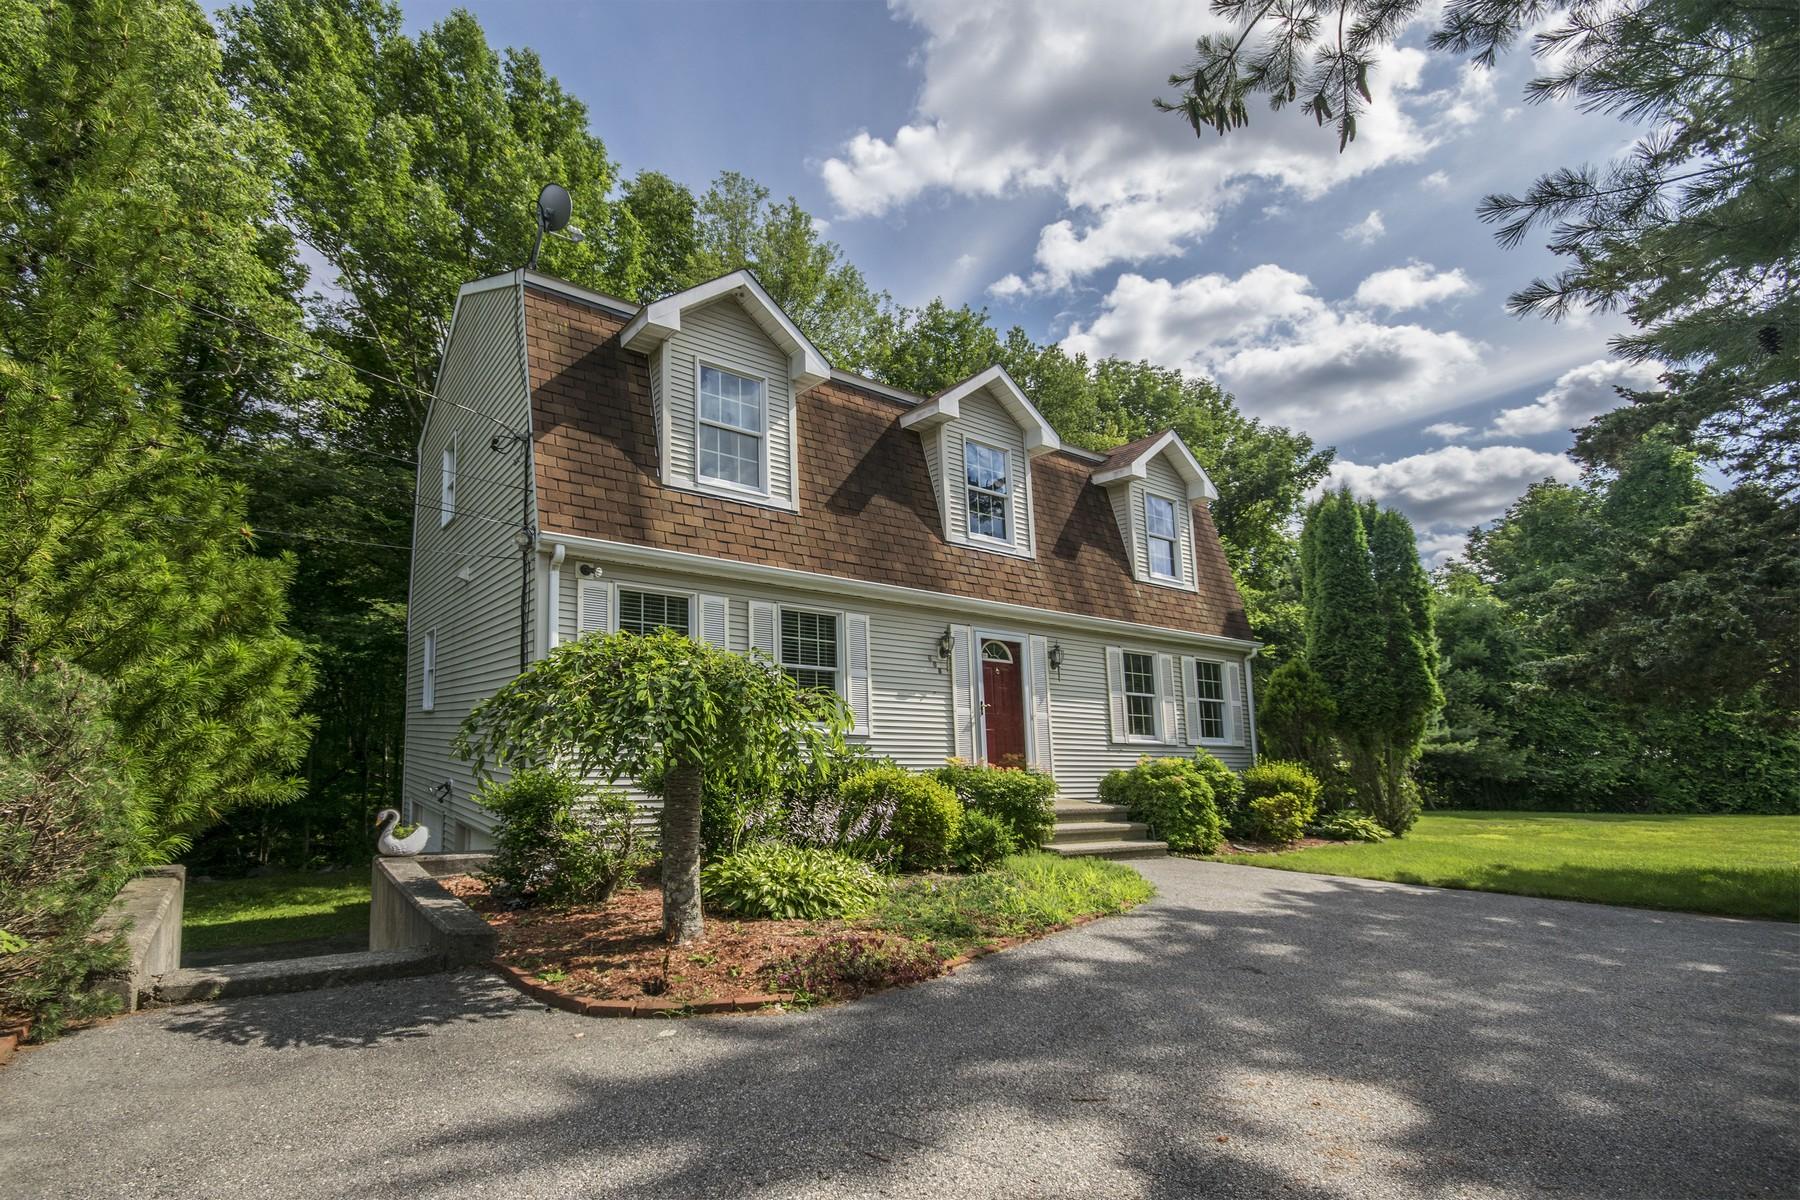 Villa per Vendita alle ore 608 Danielson Pike Scituate, Rhode Island 02857 Stati Uniti